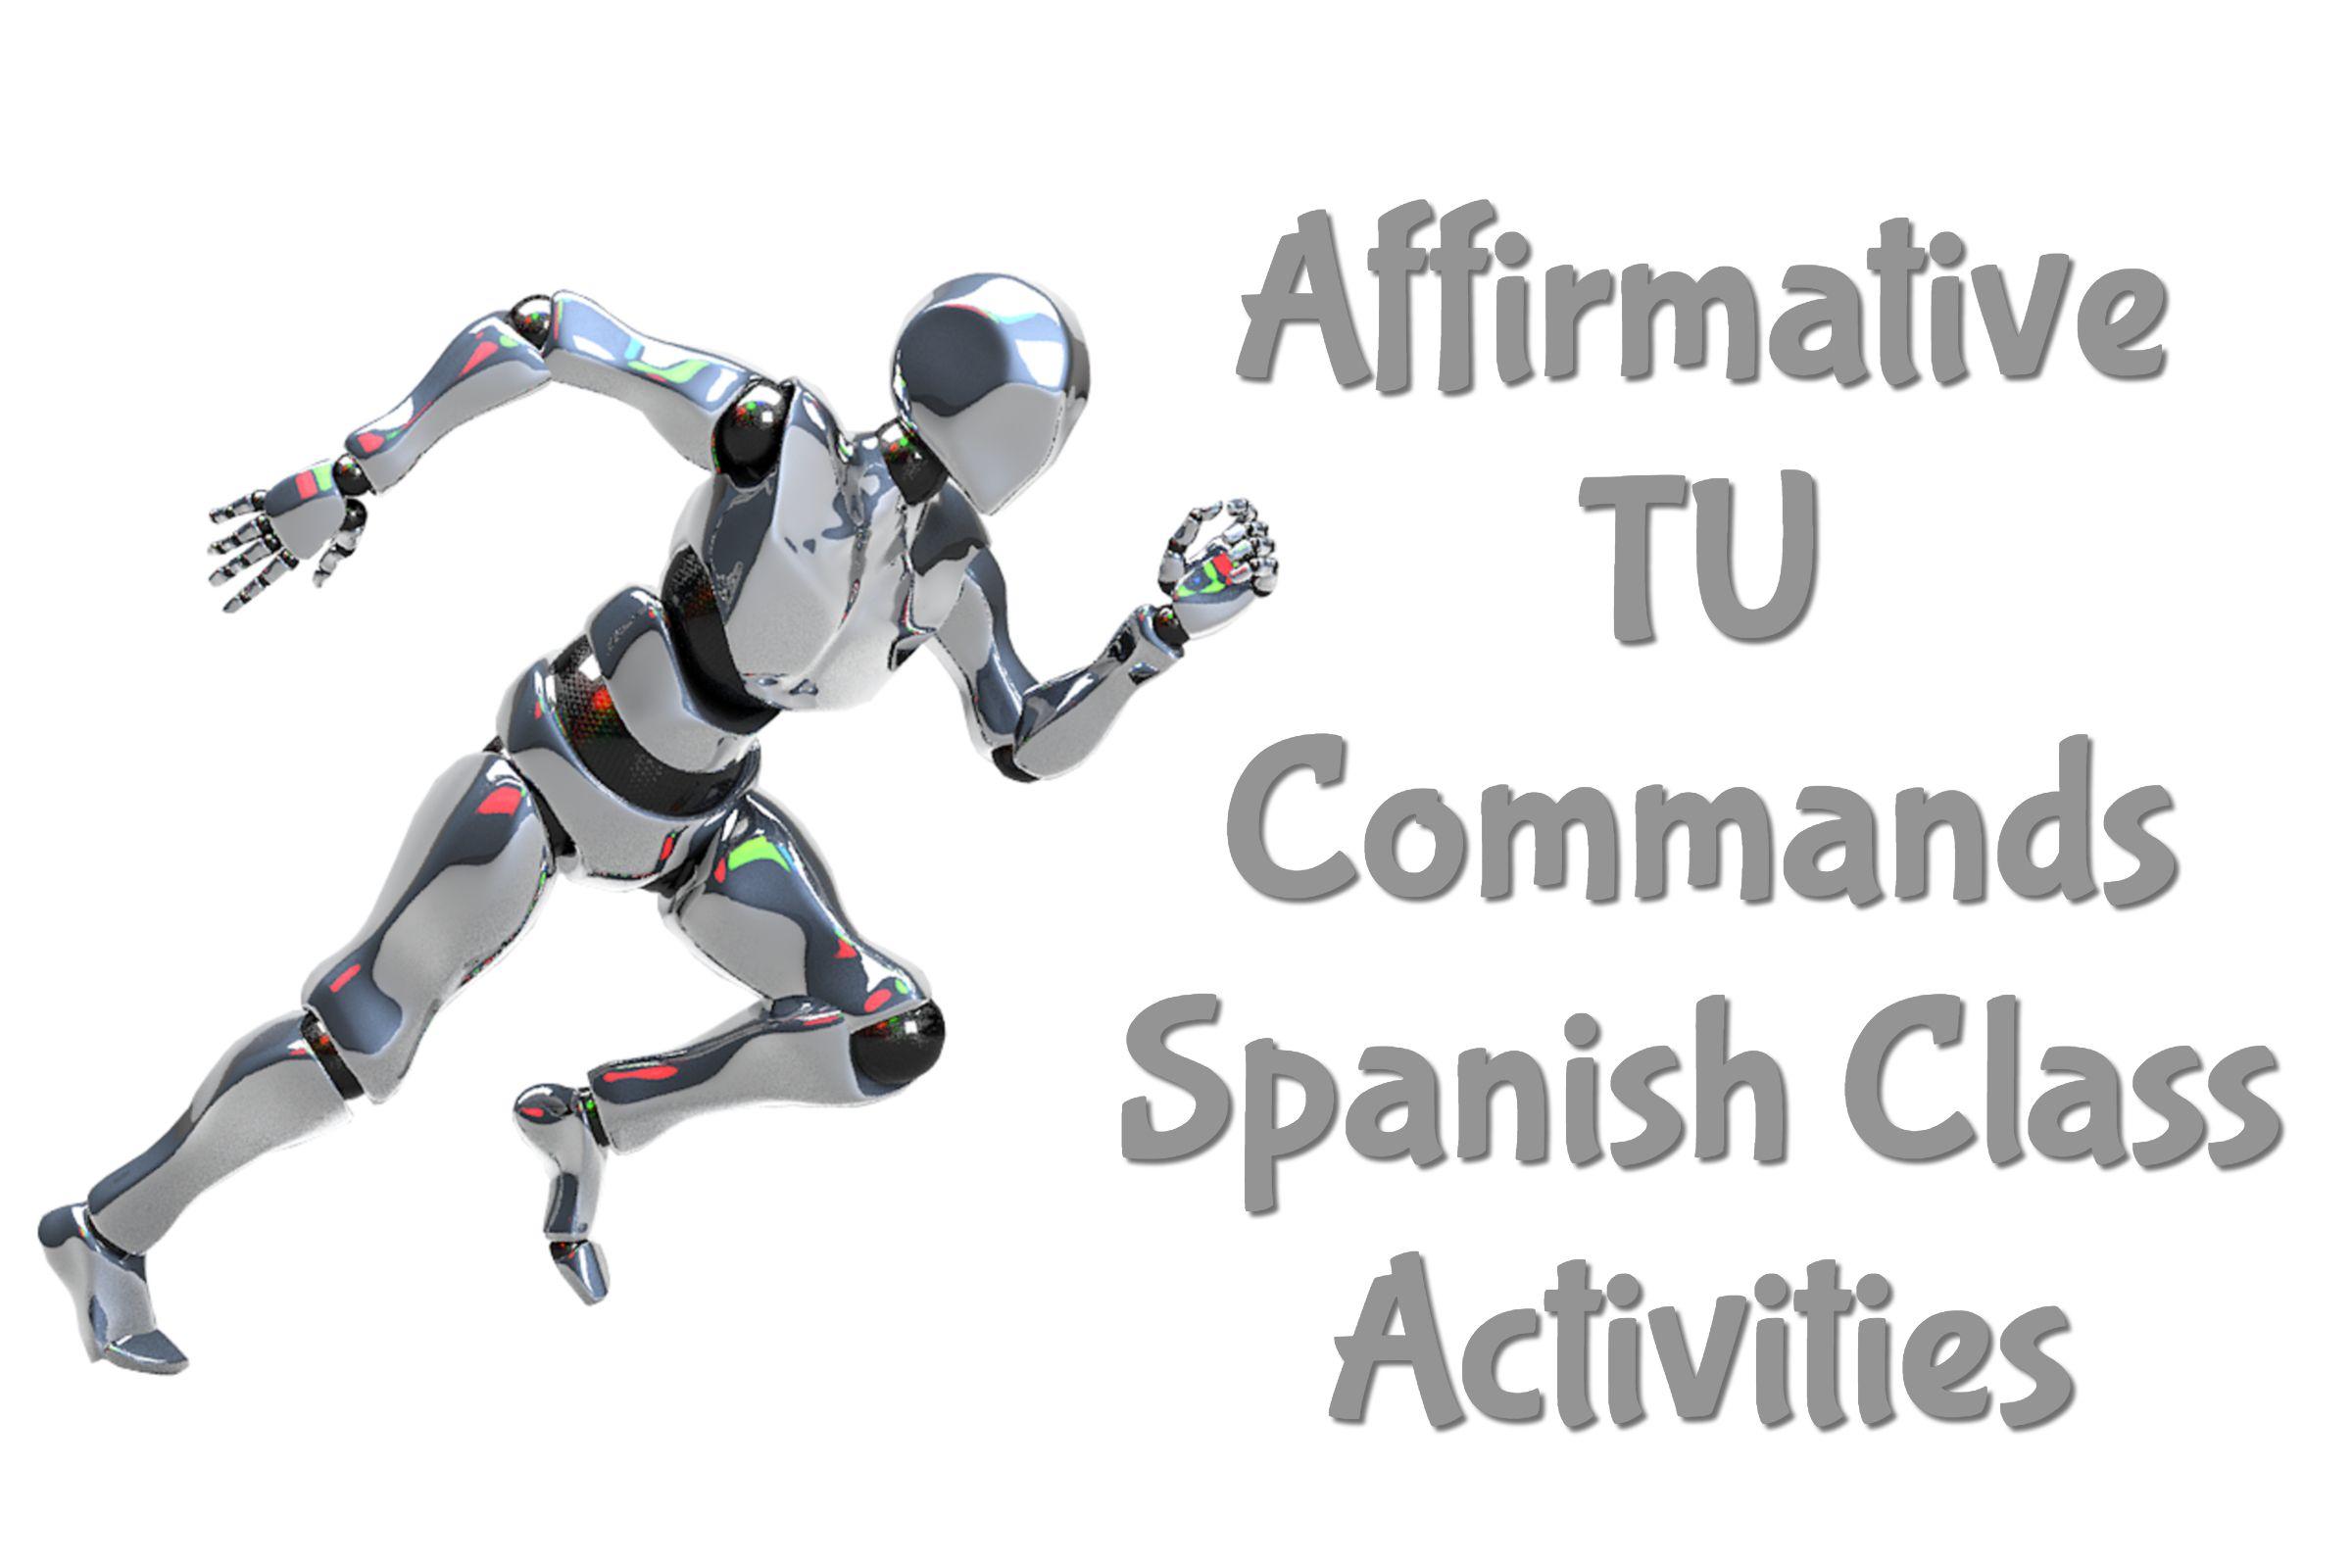 Affirmative Tu Commands Spanish Class Activities